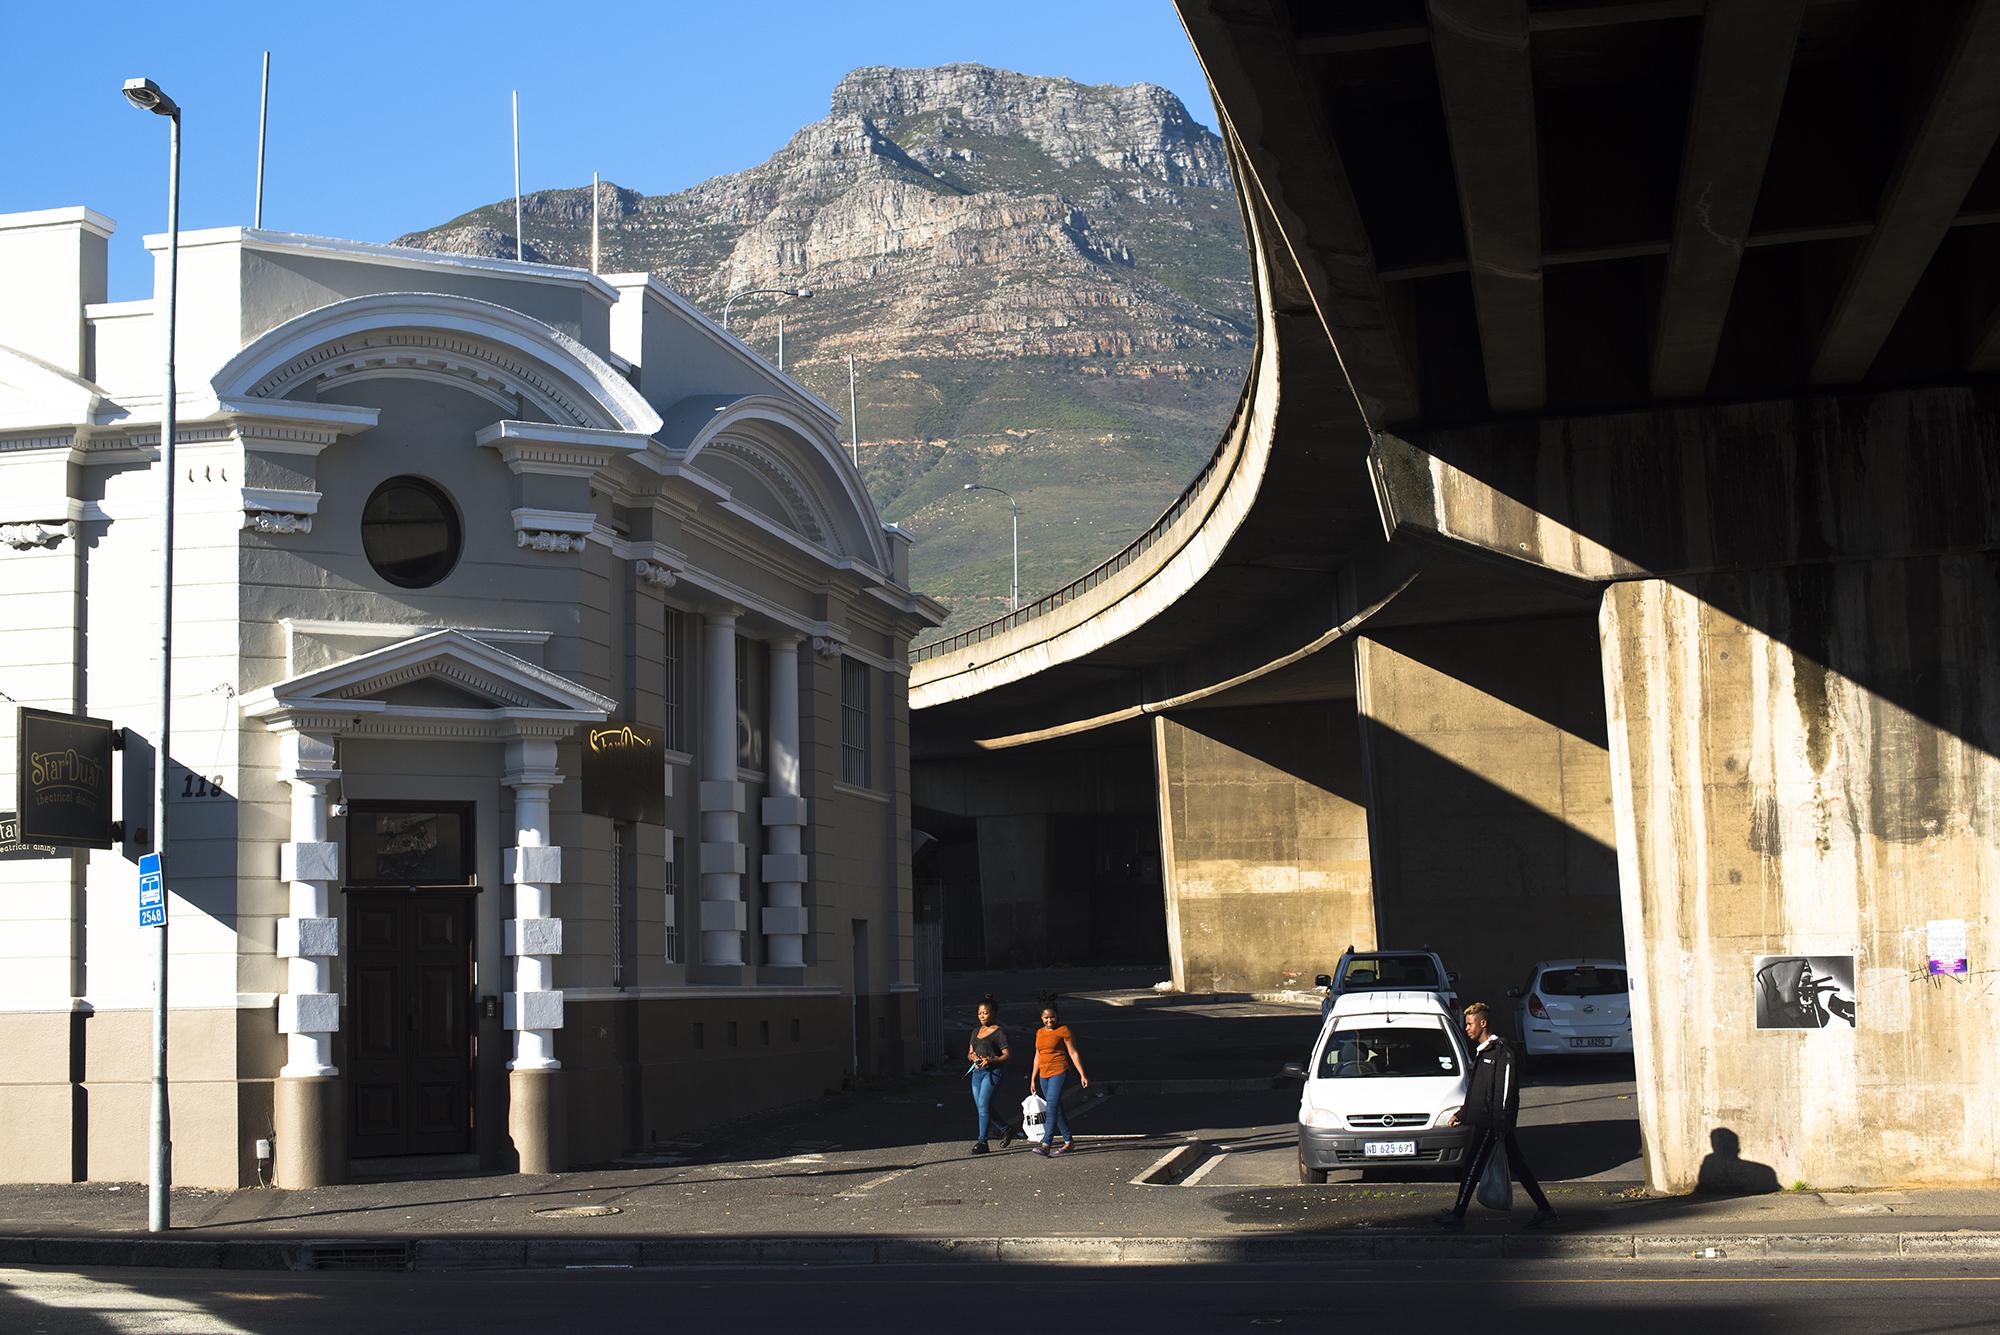 SouthAfrica-8489.jpg